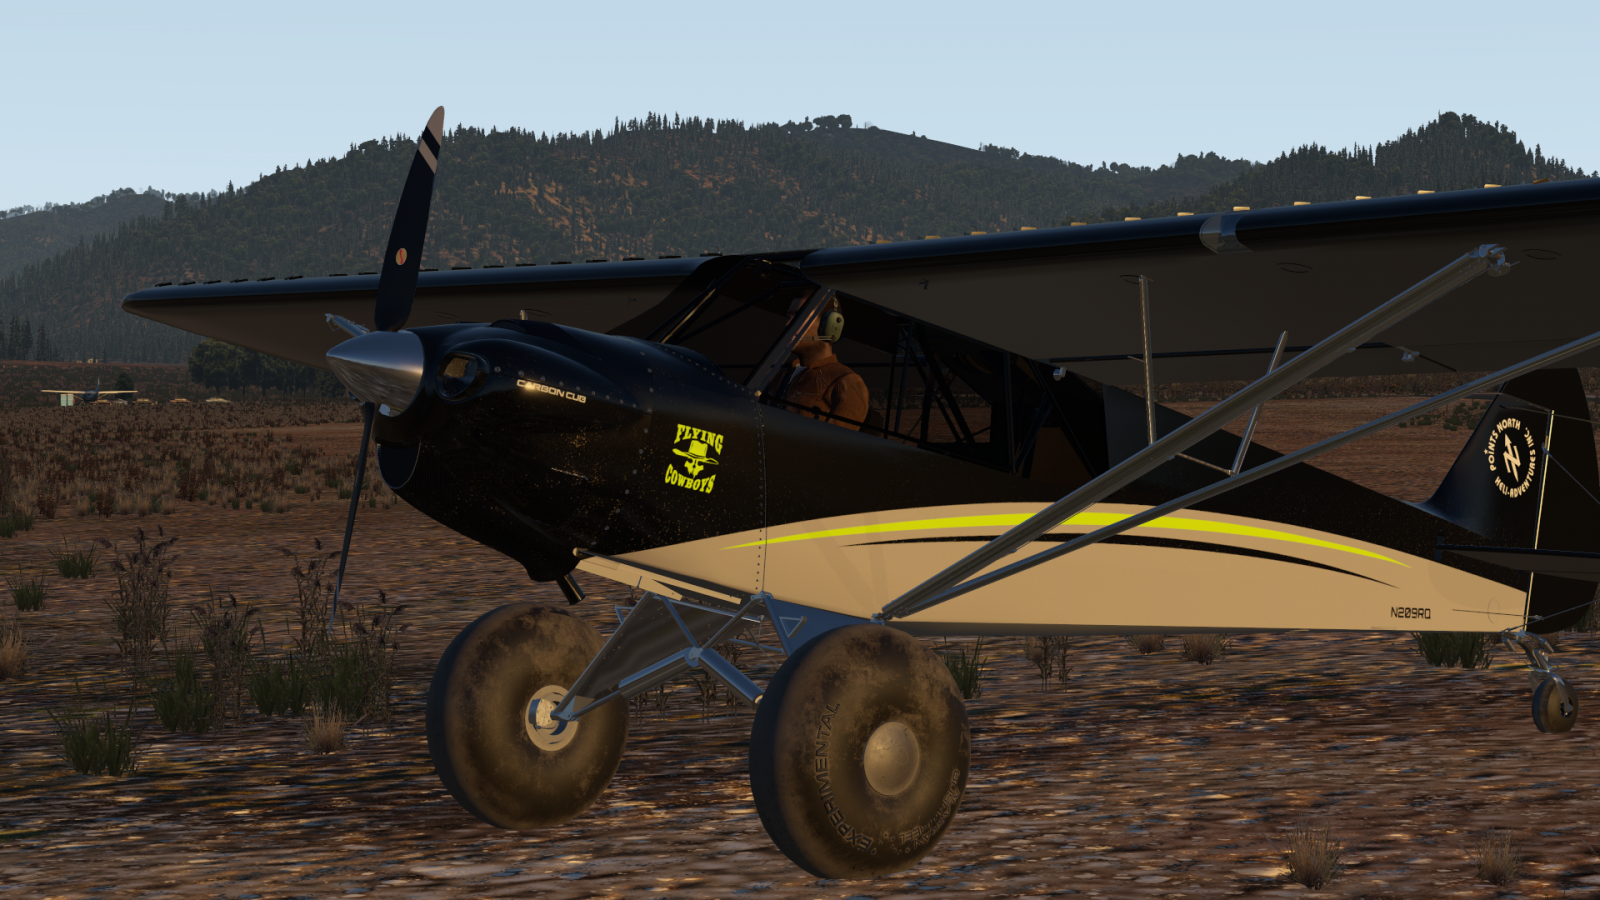 CubCrafters Carbon Cub EX - Big Tire Productions - X-Plane Org Forum